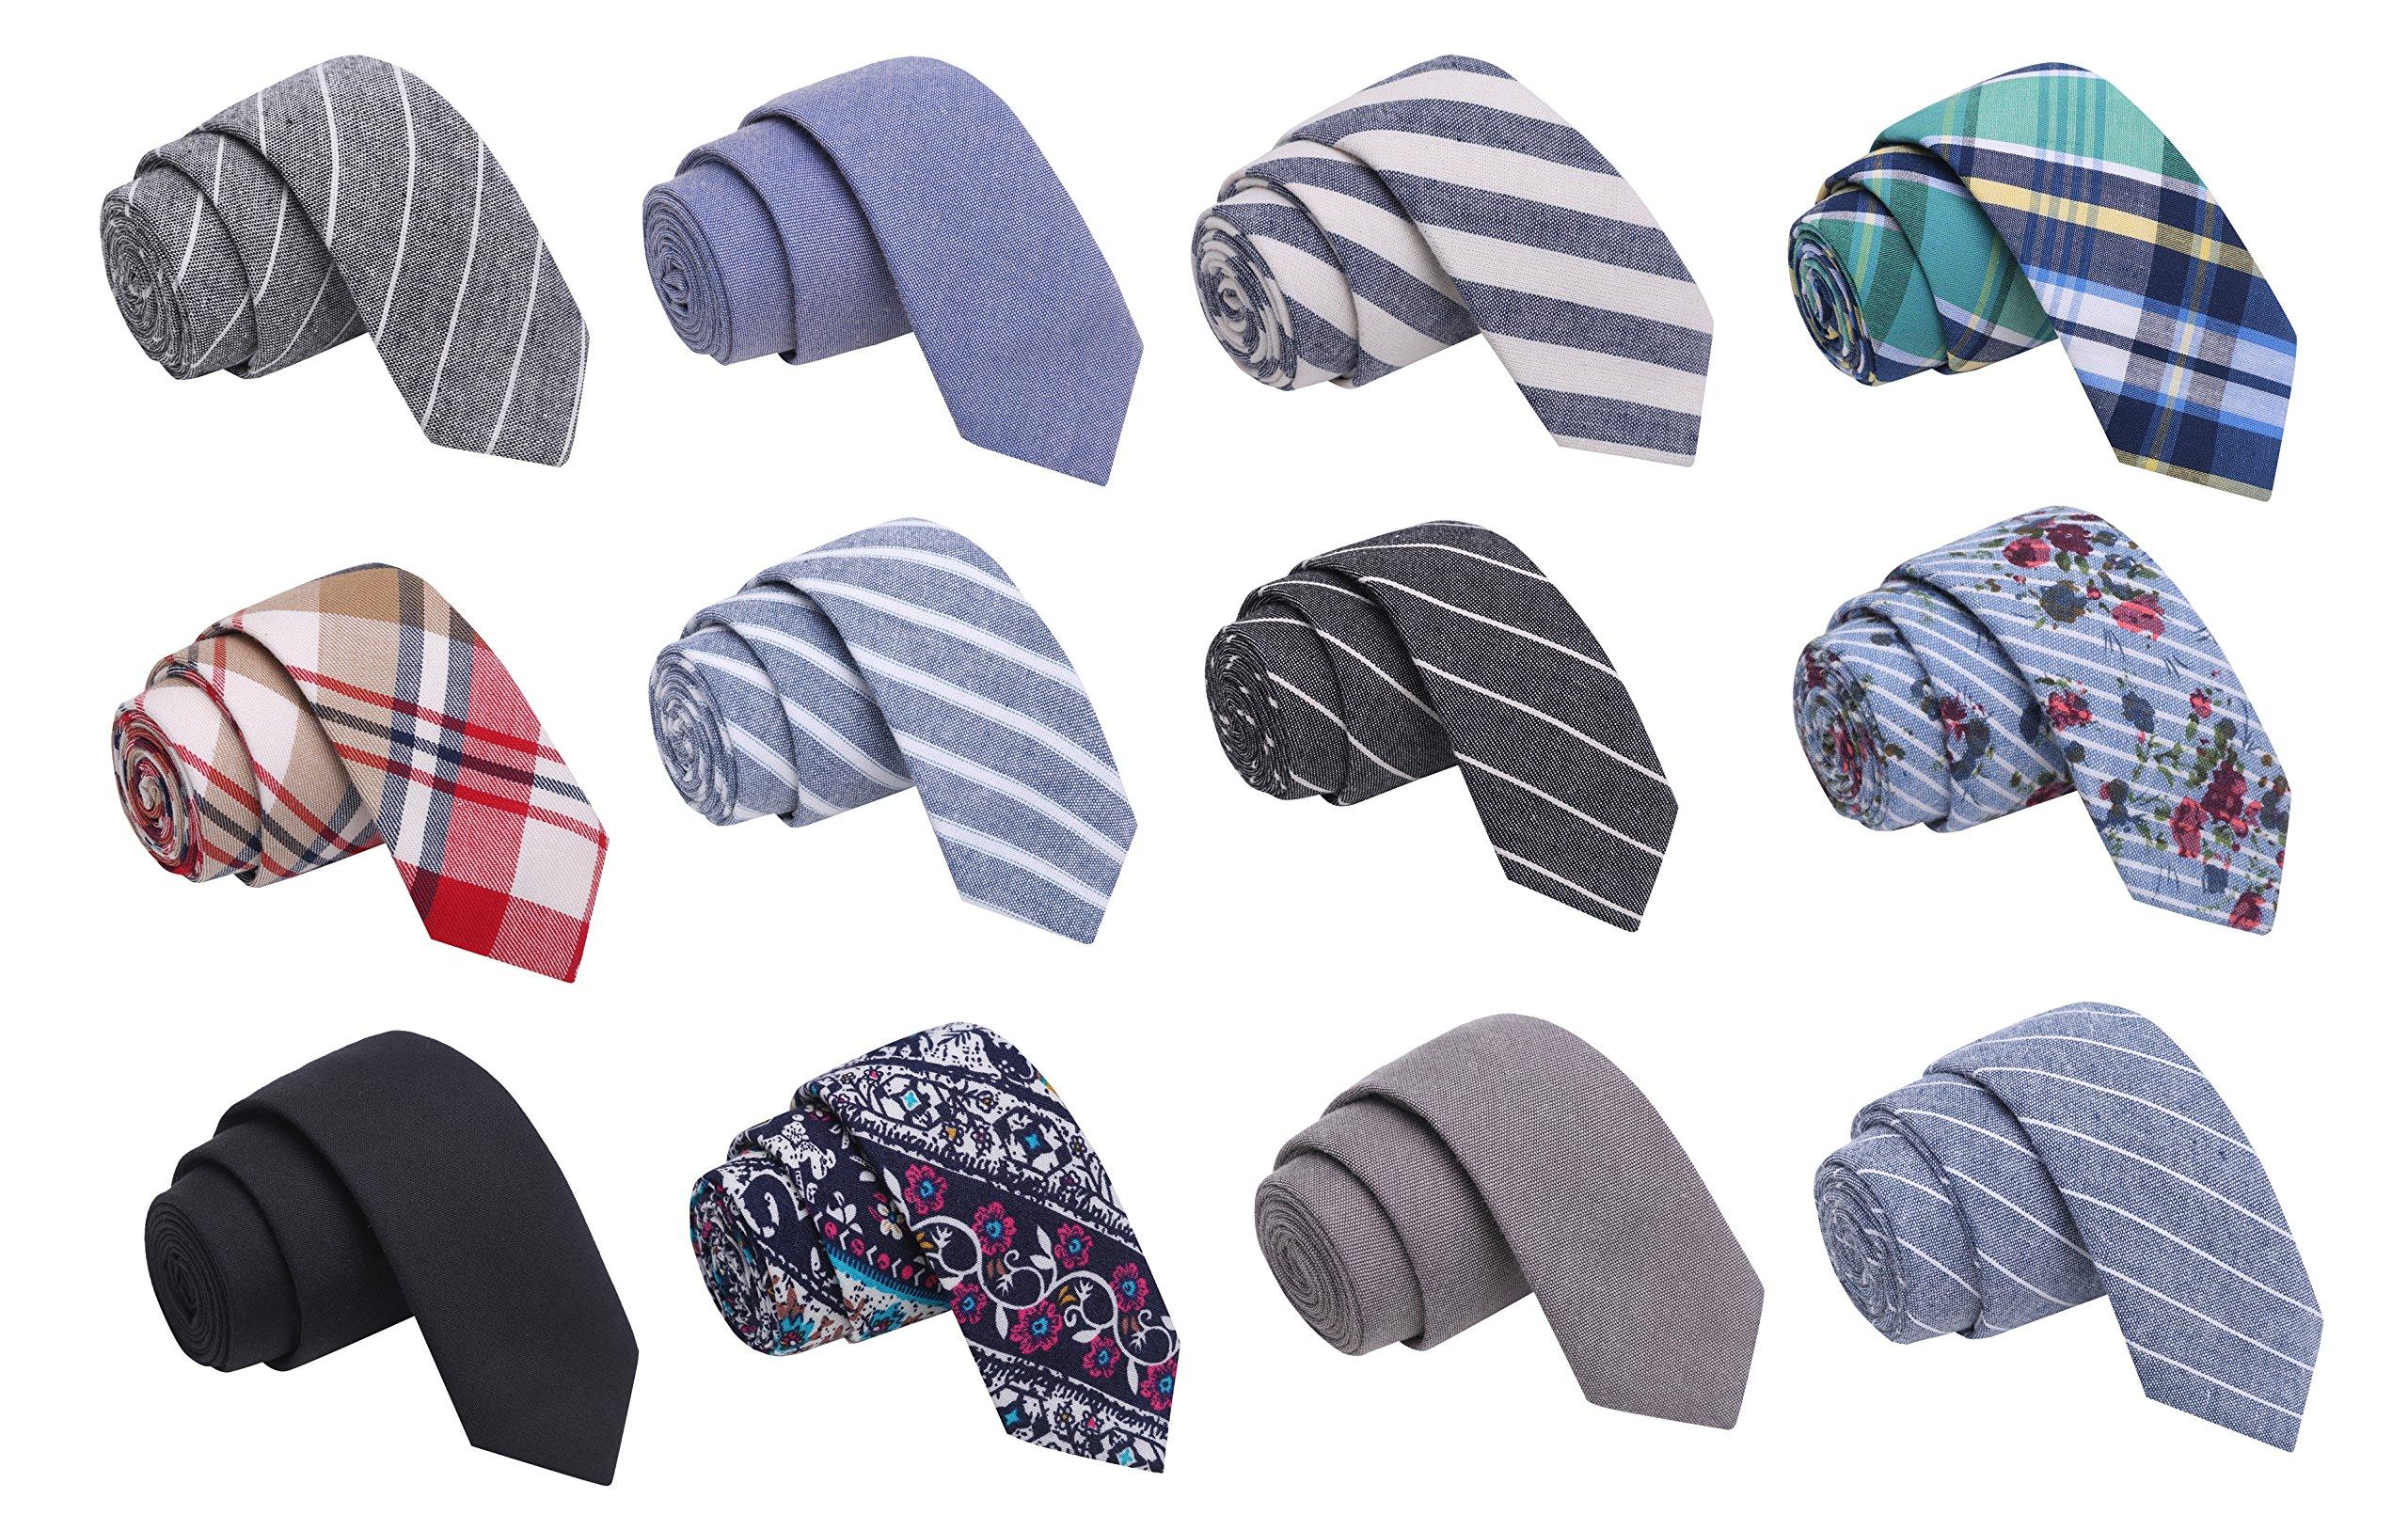 Skinny Tie Madness Men's Fashion Bundle of 12, 2'' Skinny Ties - Color Pop Bundle